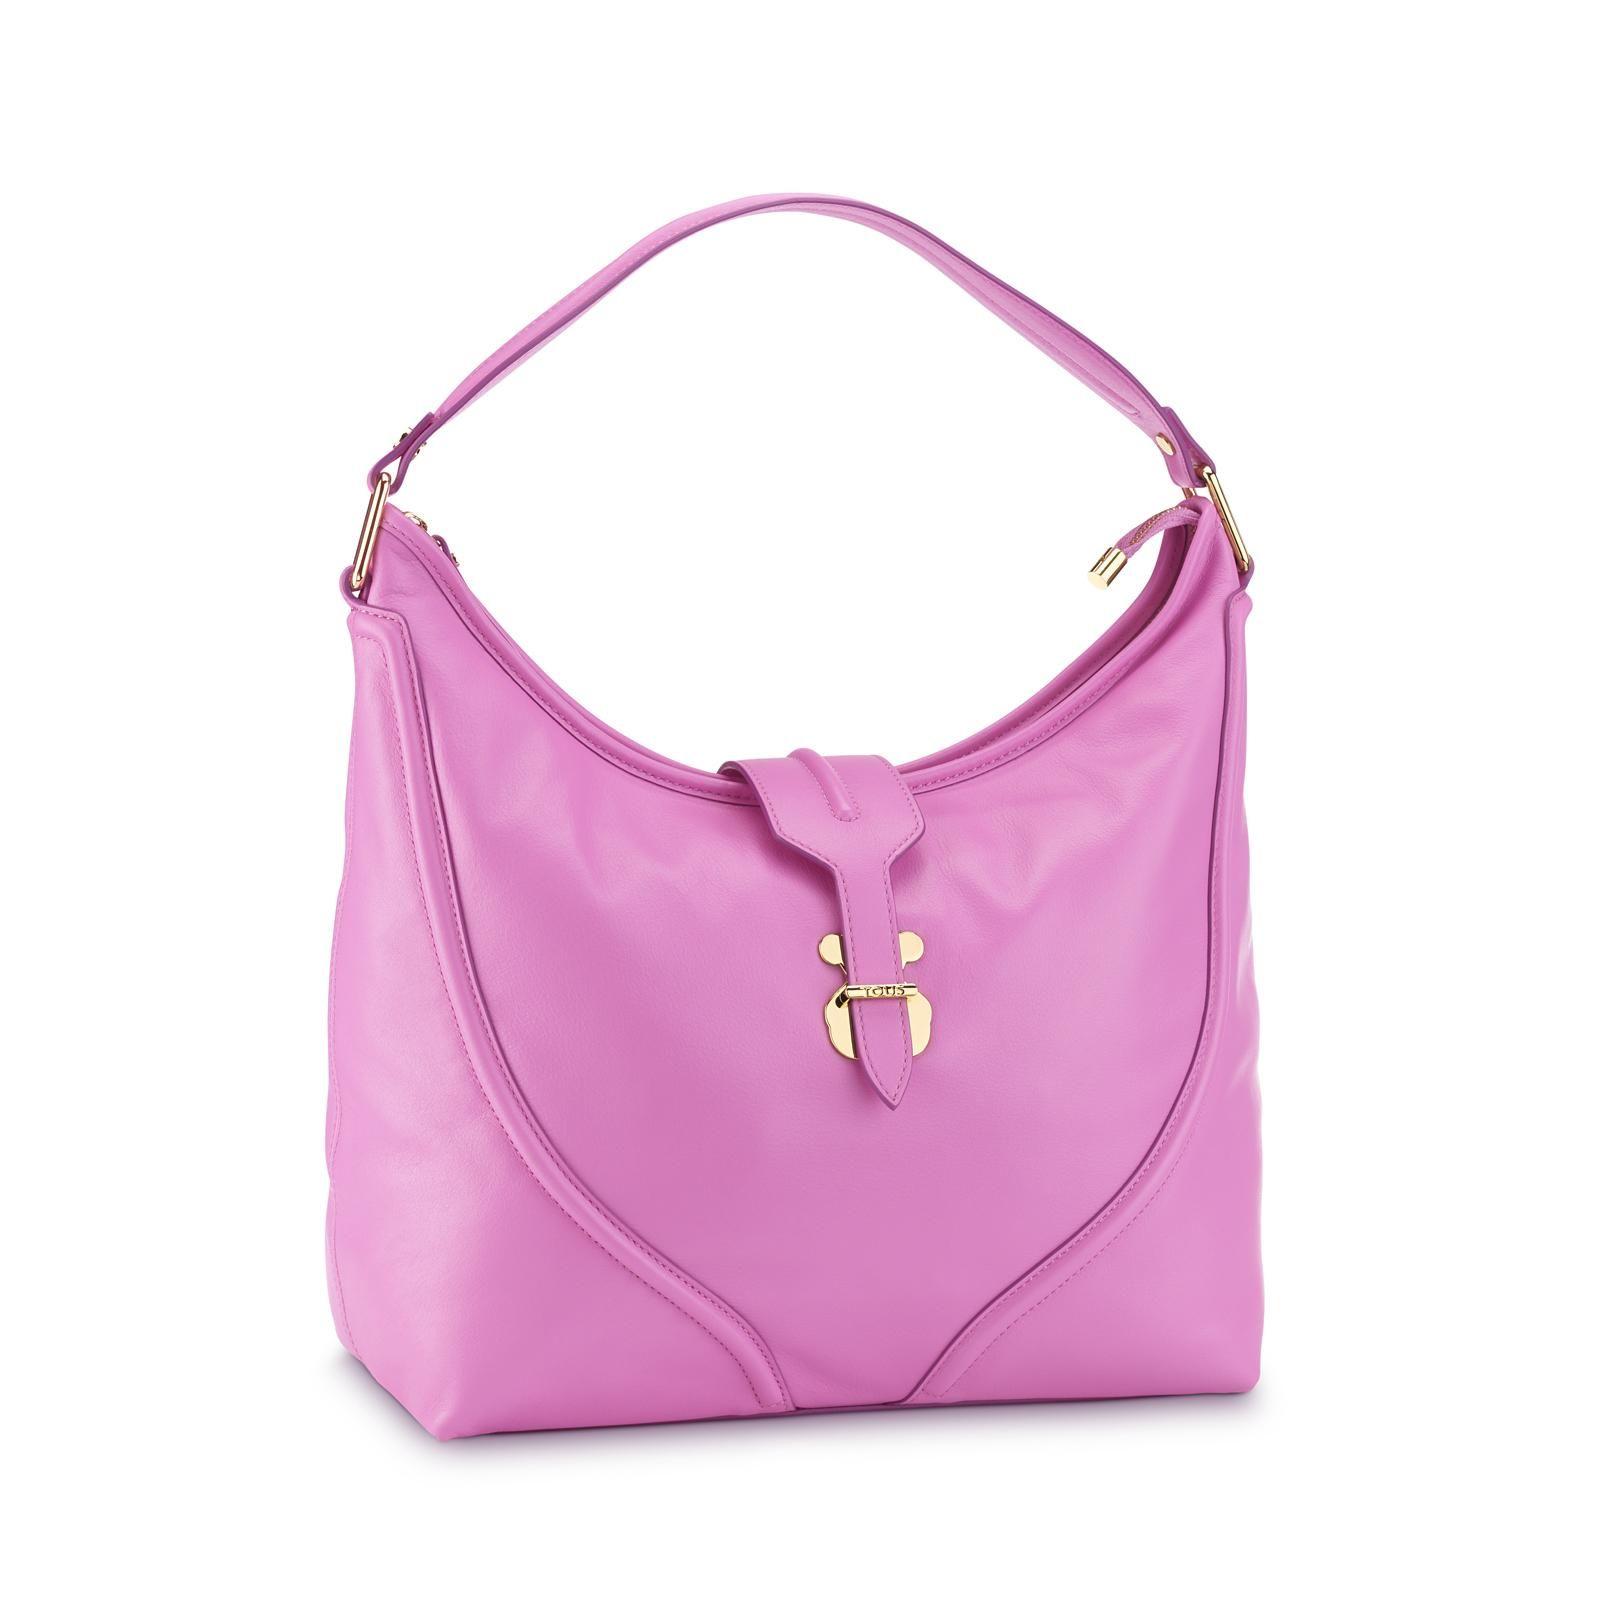 Bovine Leather Tous Trich Collection Handbag Jewelry Washington Dc